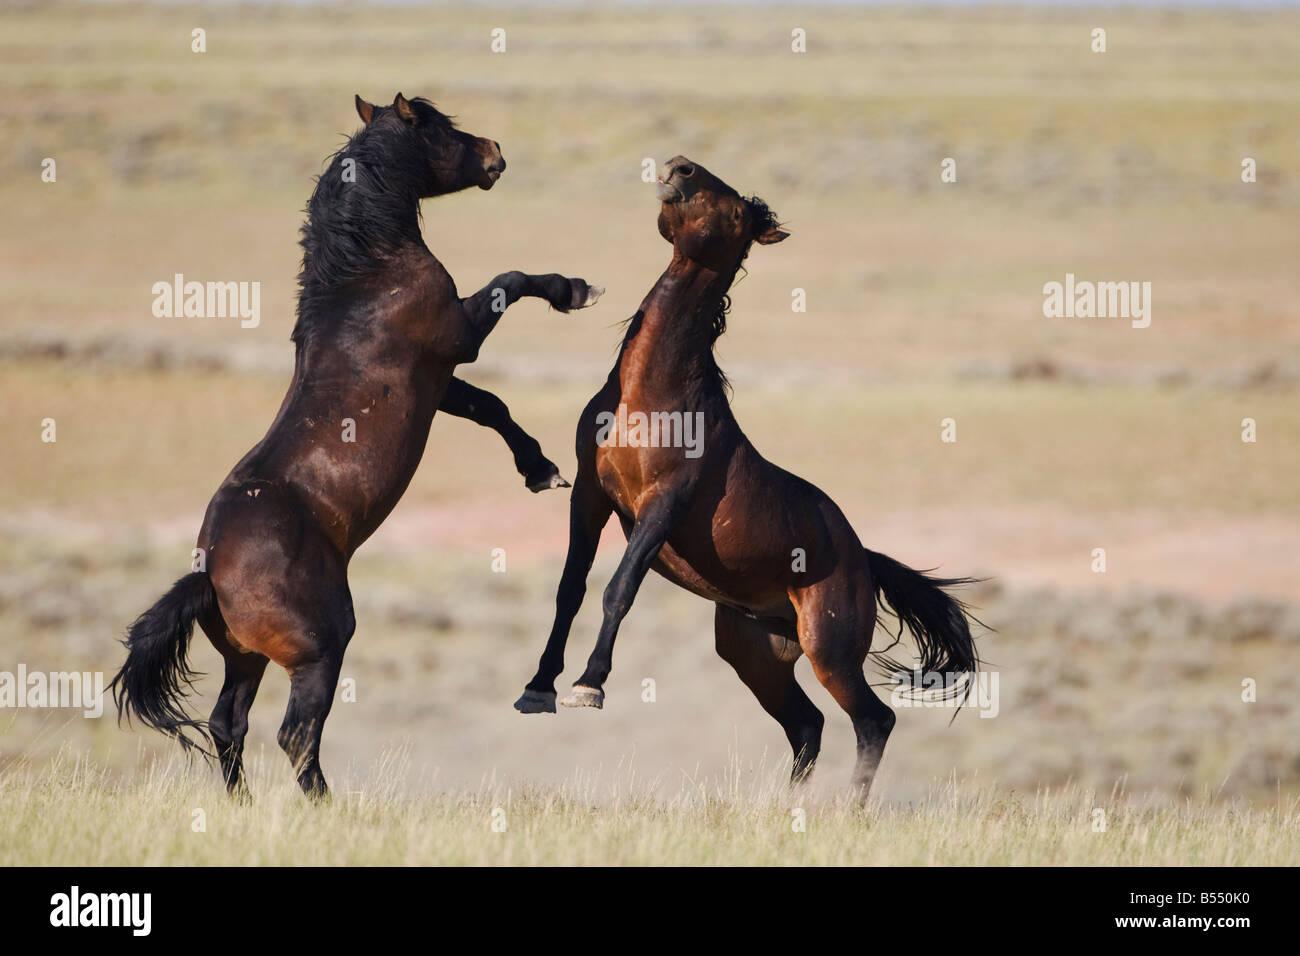 Mustang cavallo Equus caballus stalloni combattimenti Pryor Mountain Wild Horse gamma Montana USA Immagini Stock